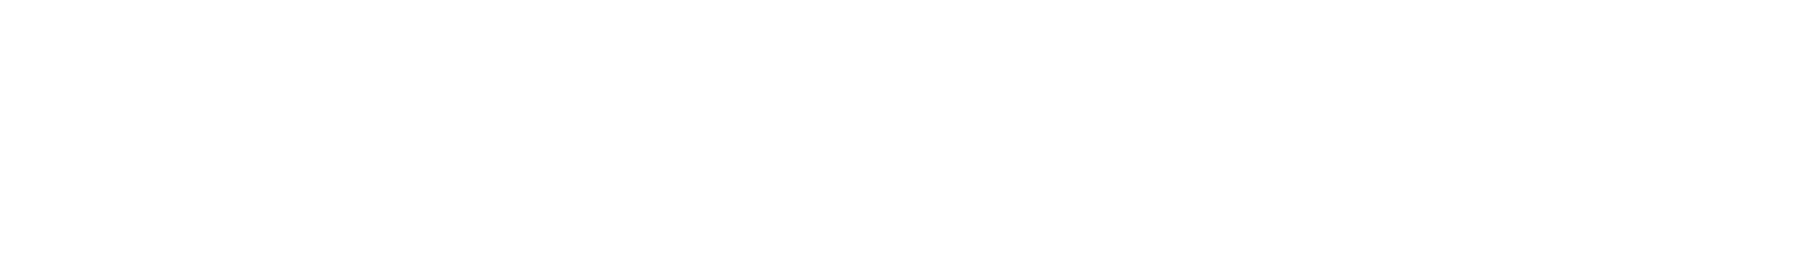 vocal fx   naming trance genre 130 bpm